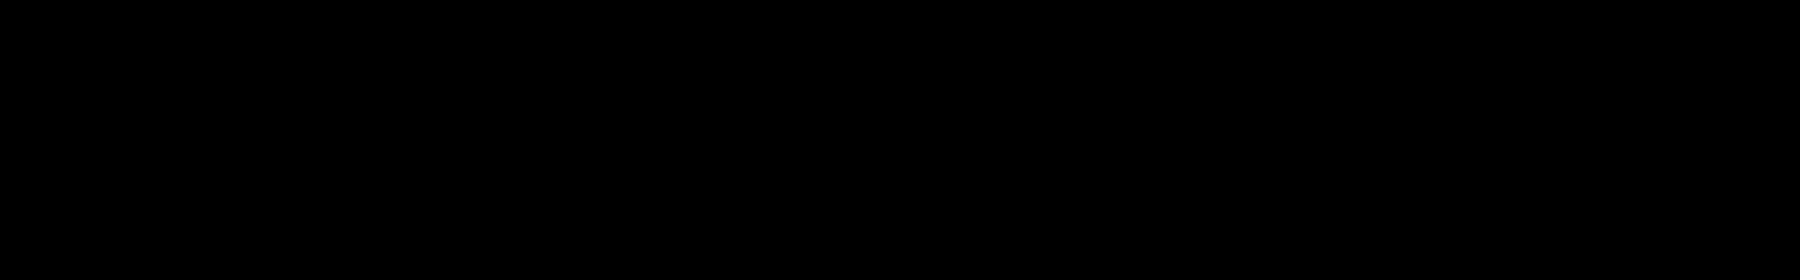 Reggaeton 2021 audio waveform